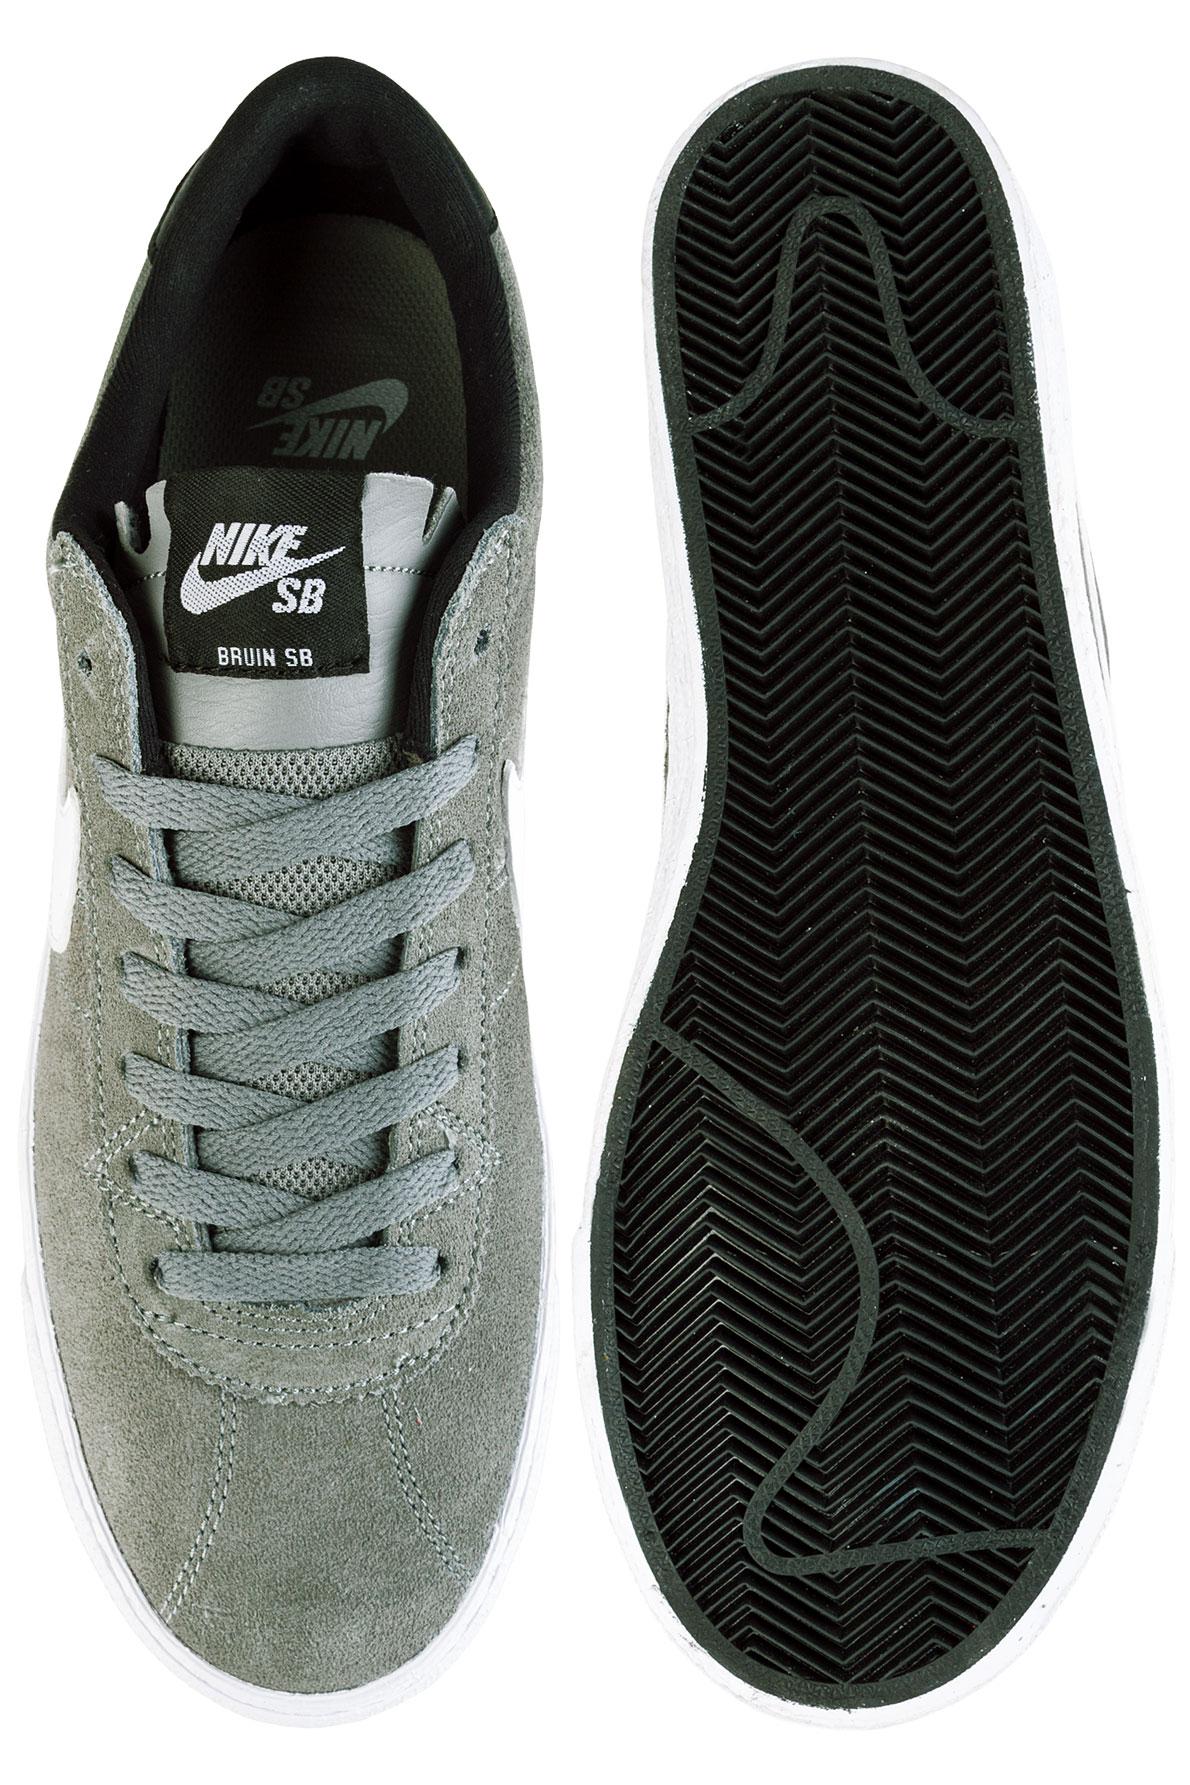 Nike Sb Bruin Premium Skate Shoes Tumbled Grey White White Black